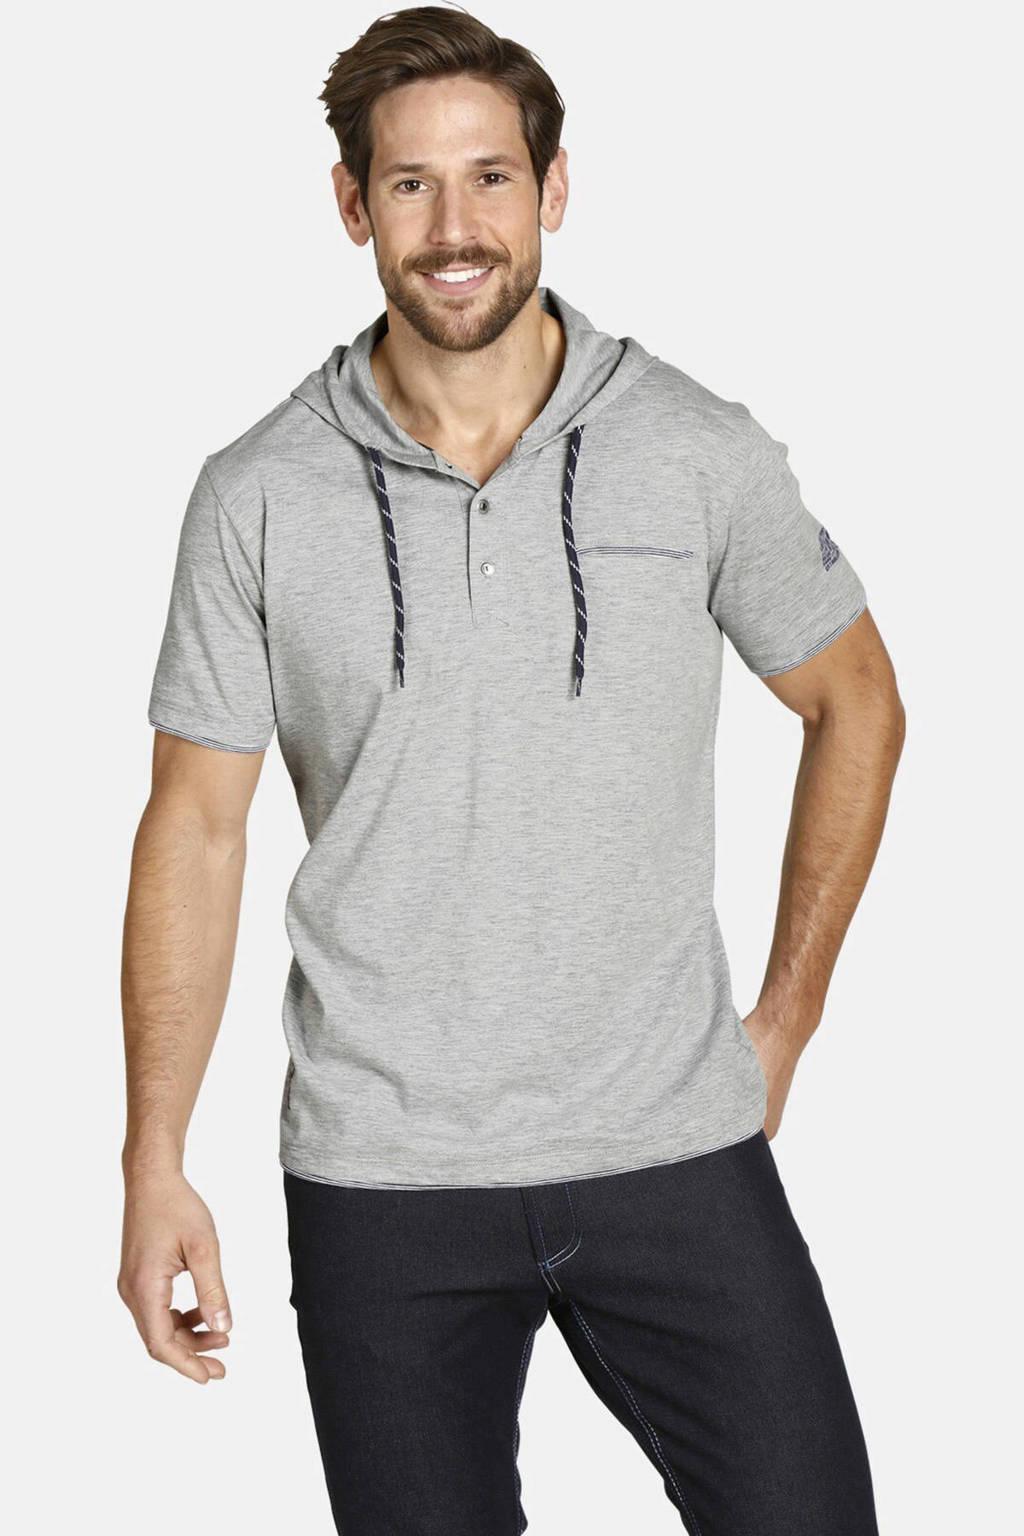 Jan Vanderstorm T-shirt Plus Size Offe lichtgrijs melange, Lichtgrijs melange